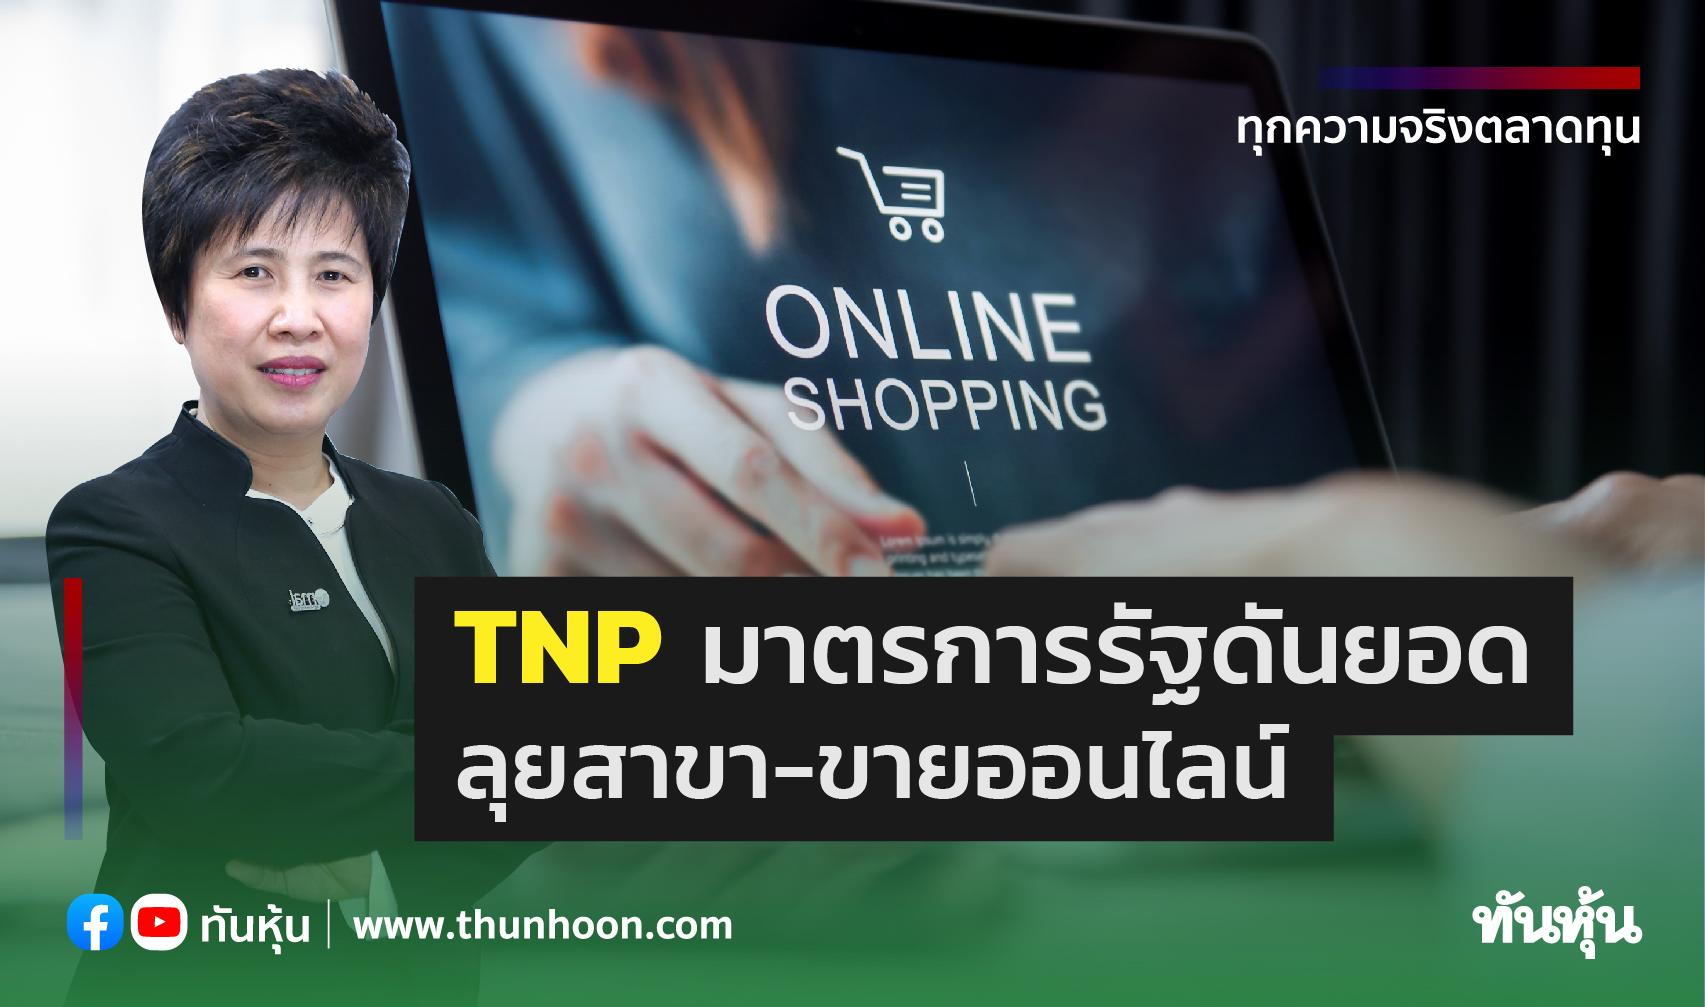 TNPมาตรการรัฐดันยอด ลุยสาขา-ขายออนไลน์